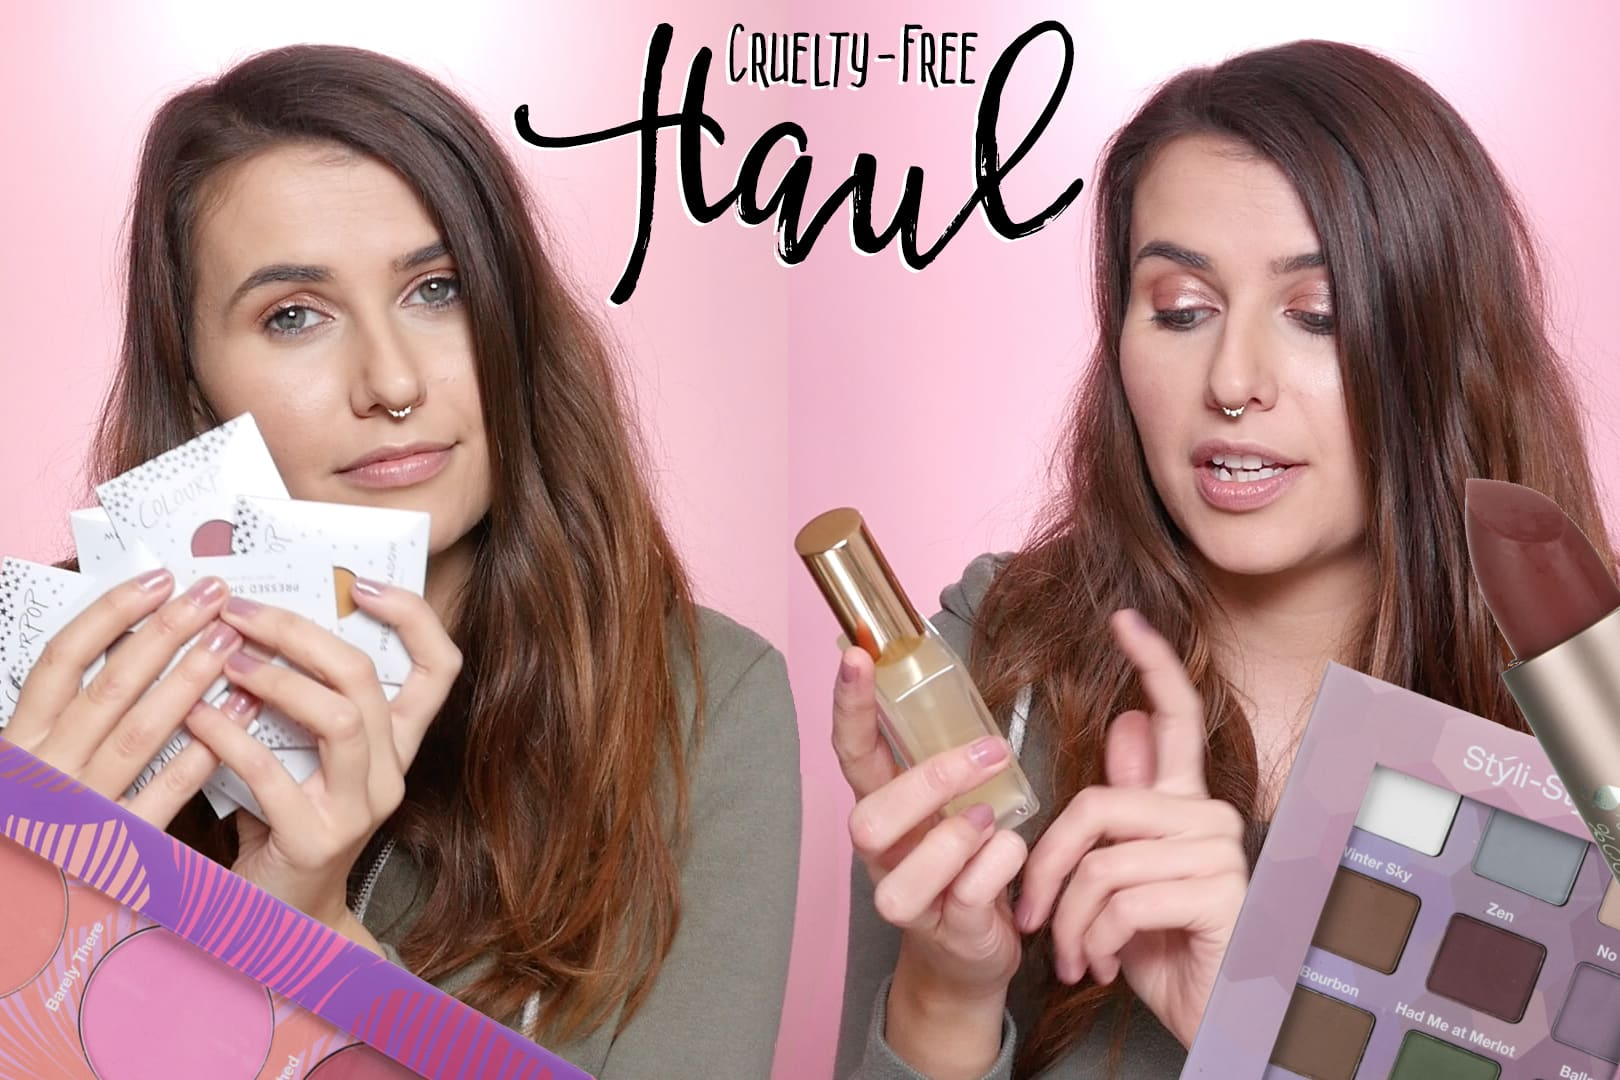 Cruelty-Free Beauty Haul